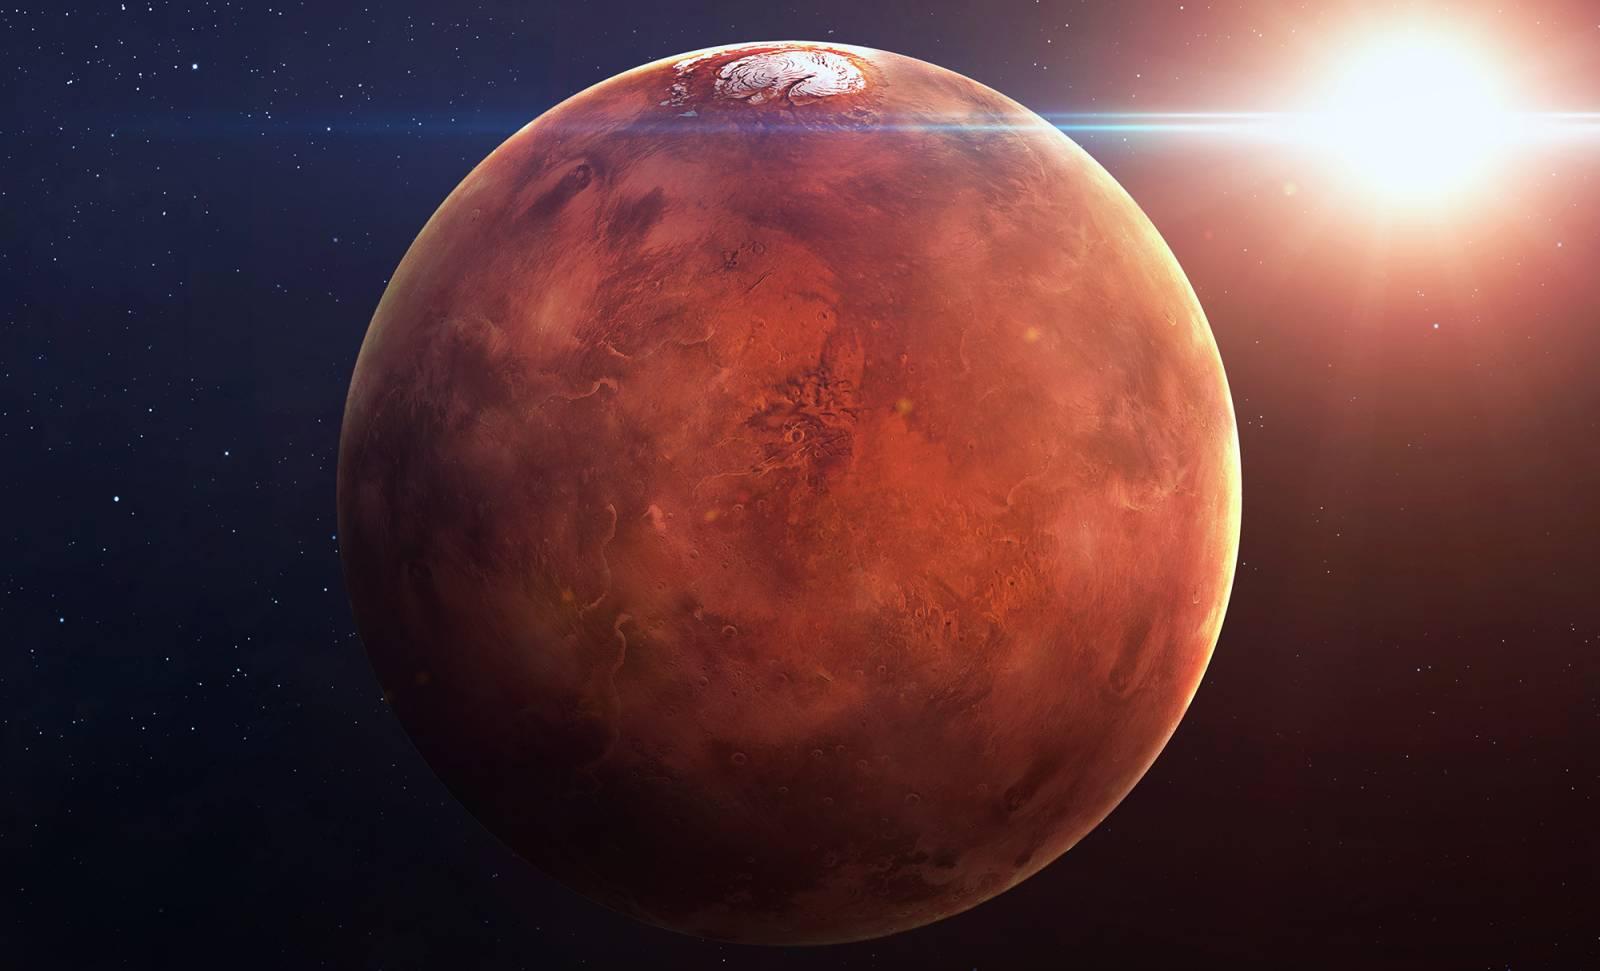 Planeta Marte. Imagine INCREDIBILA a NASA ce-a UIMIT Internetul